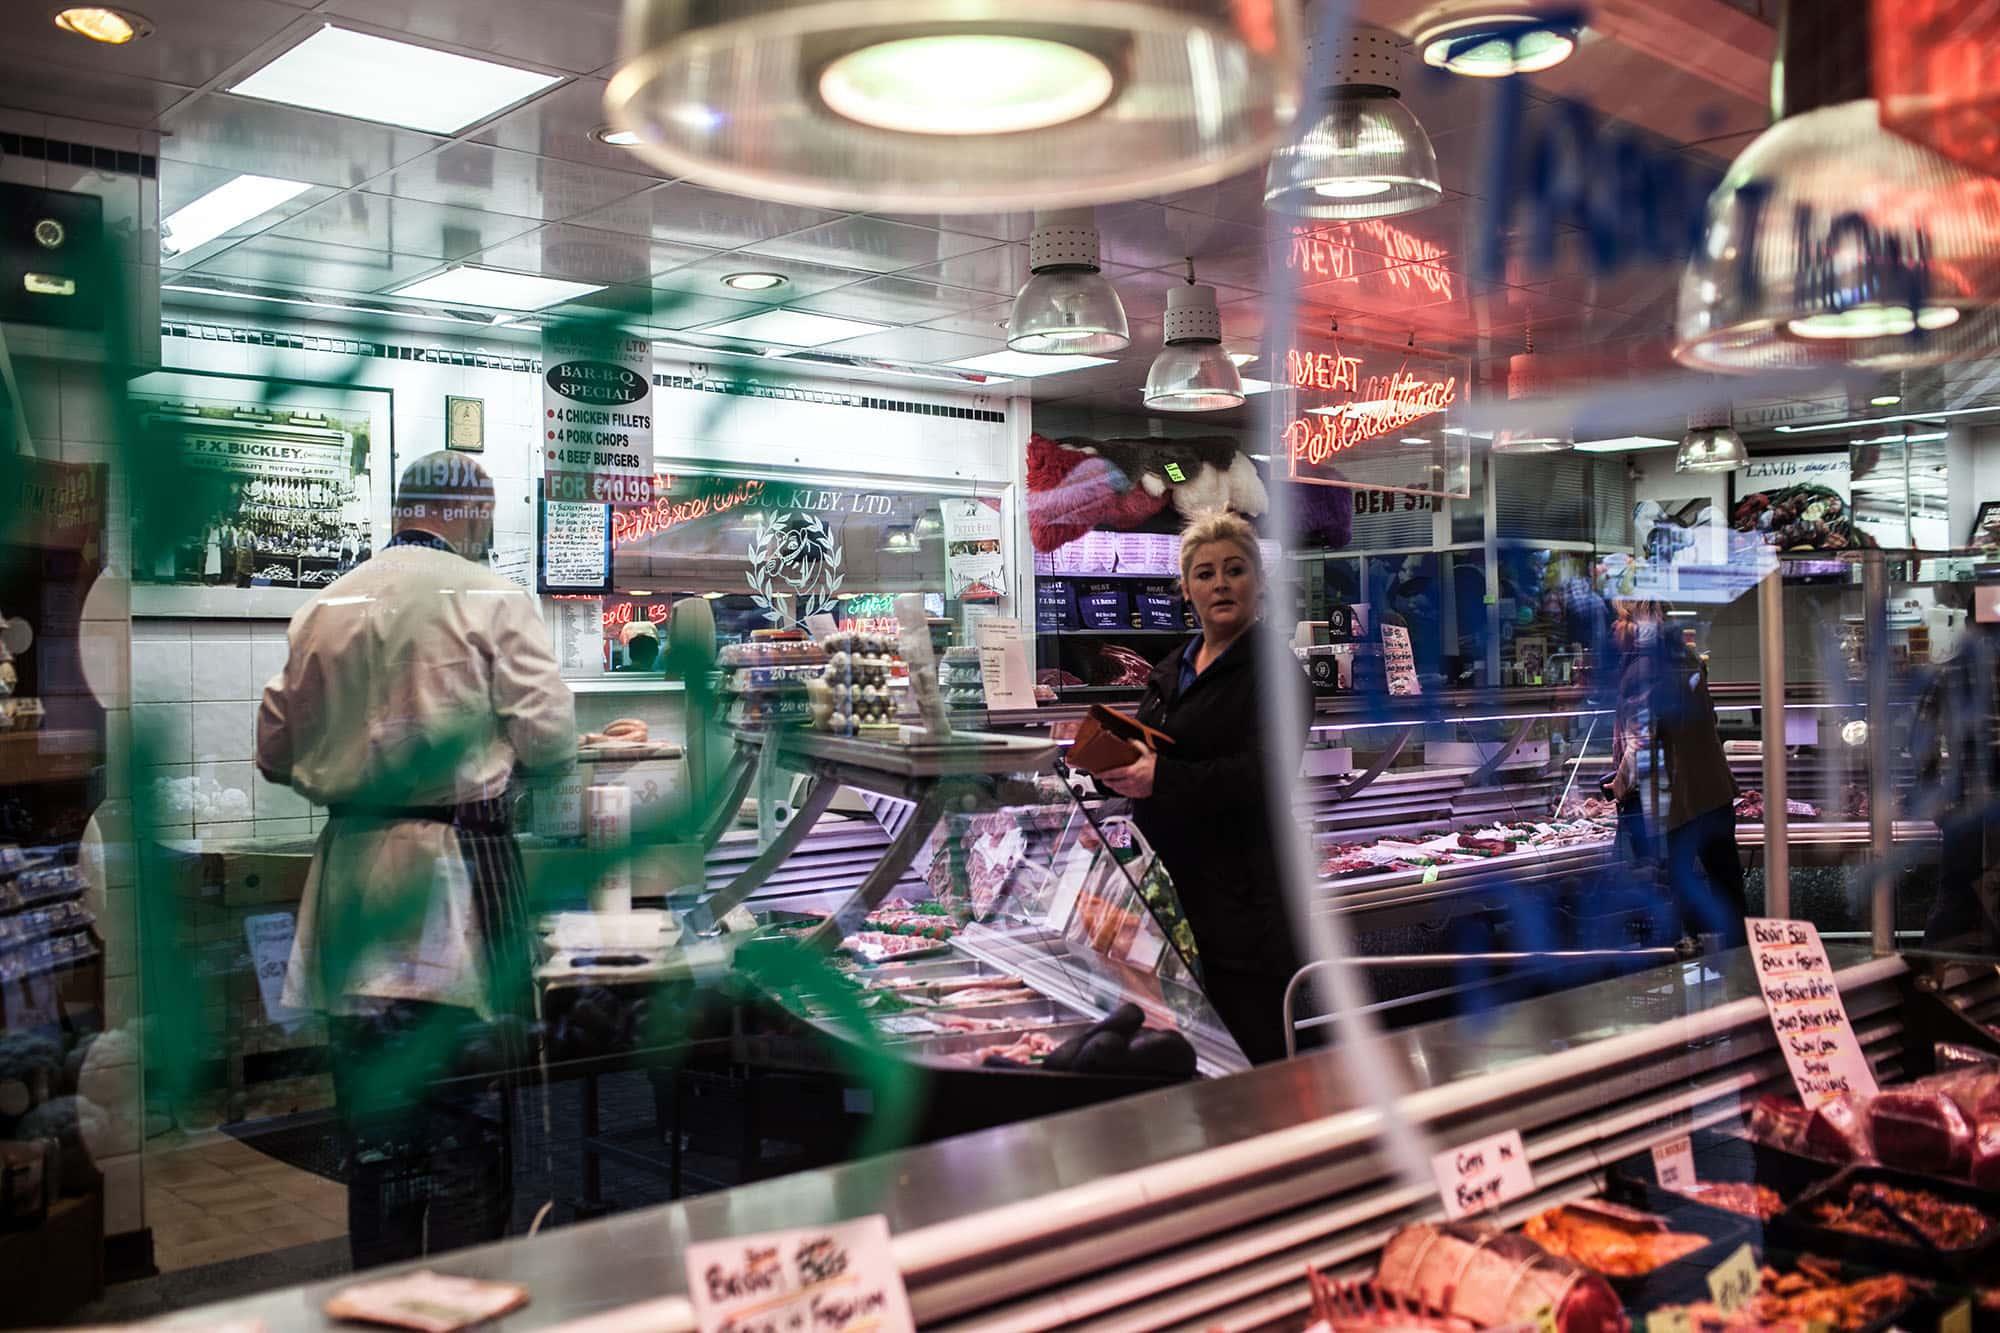 Meat shop - Dublin, Ireland